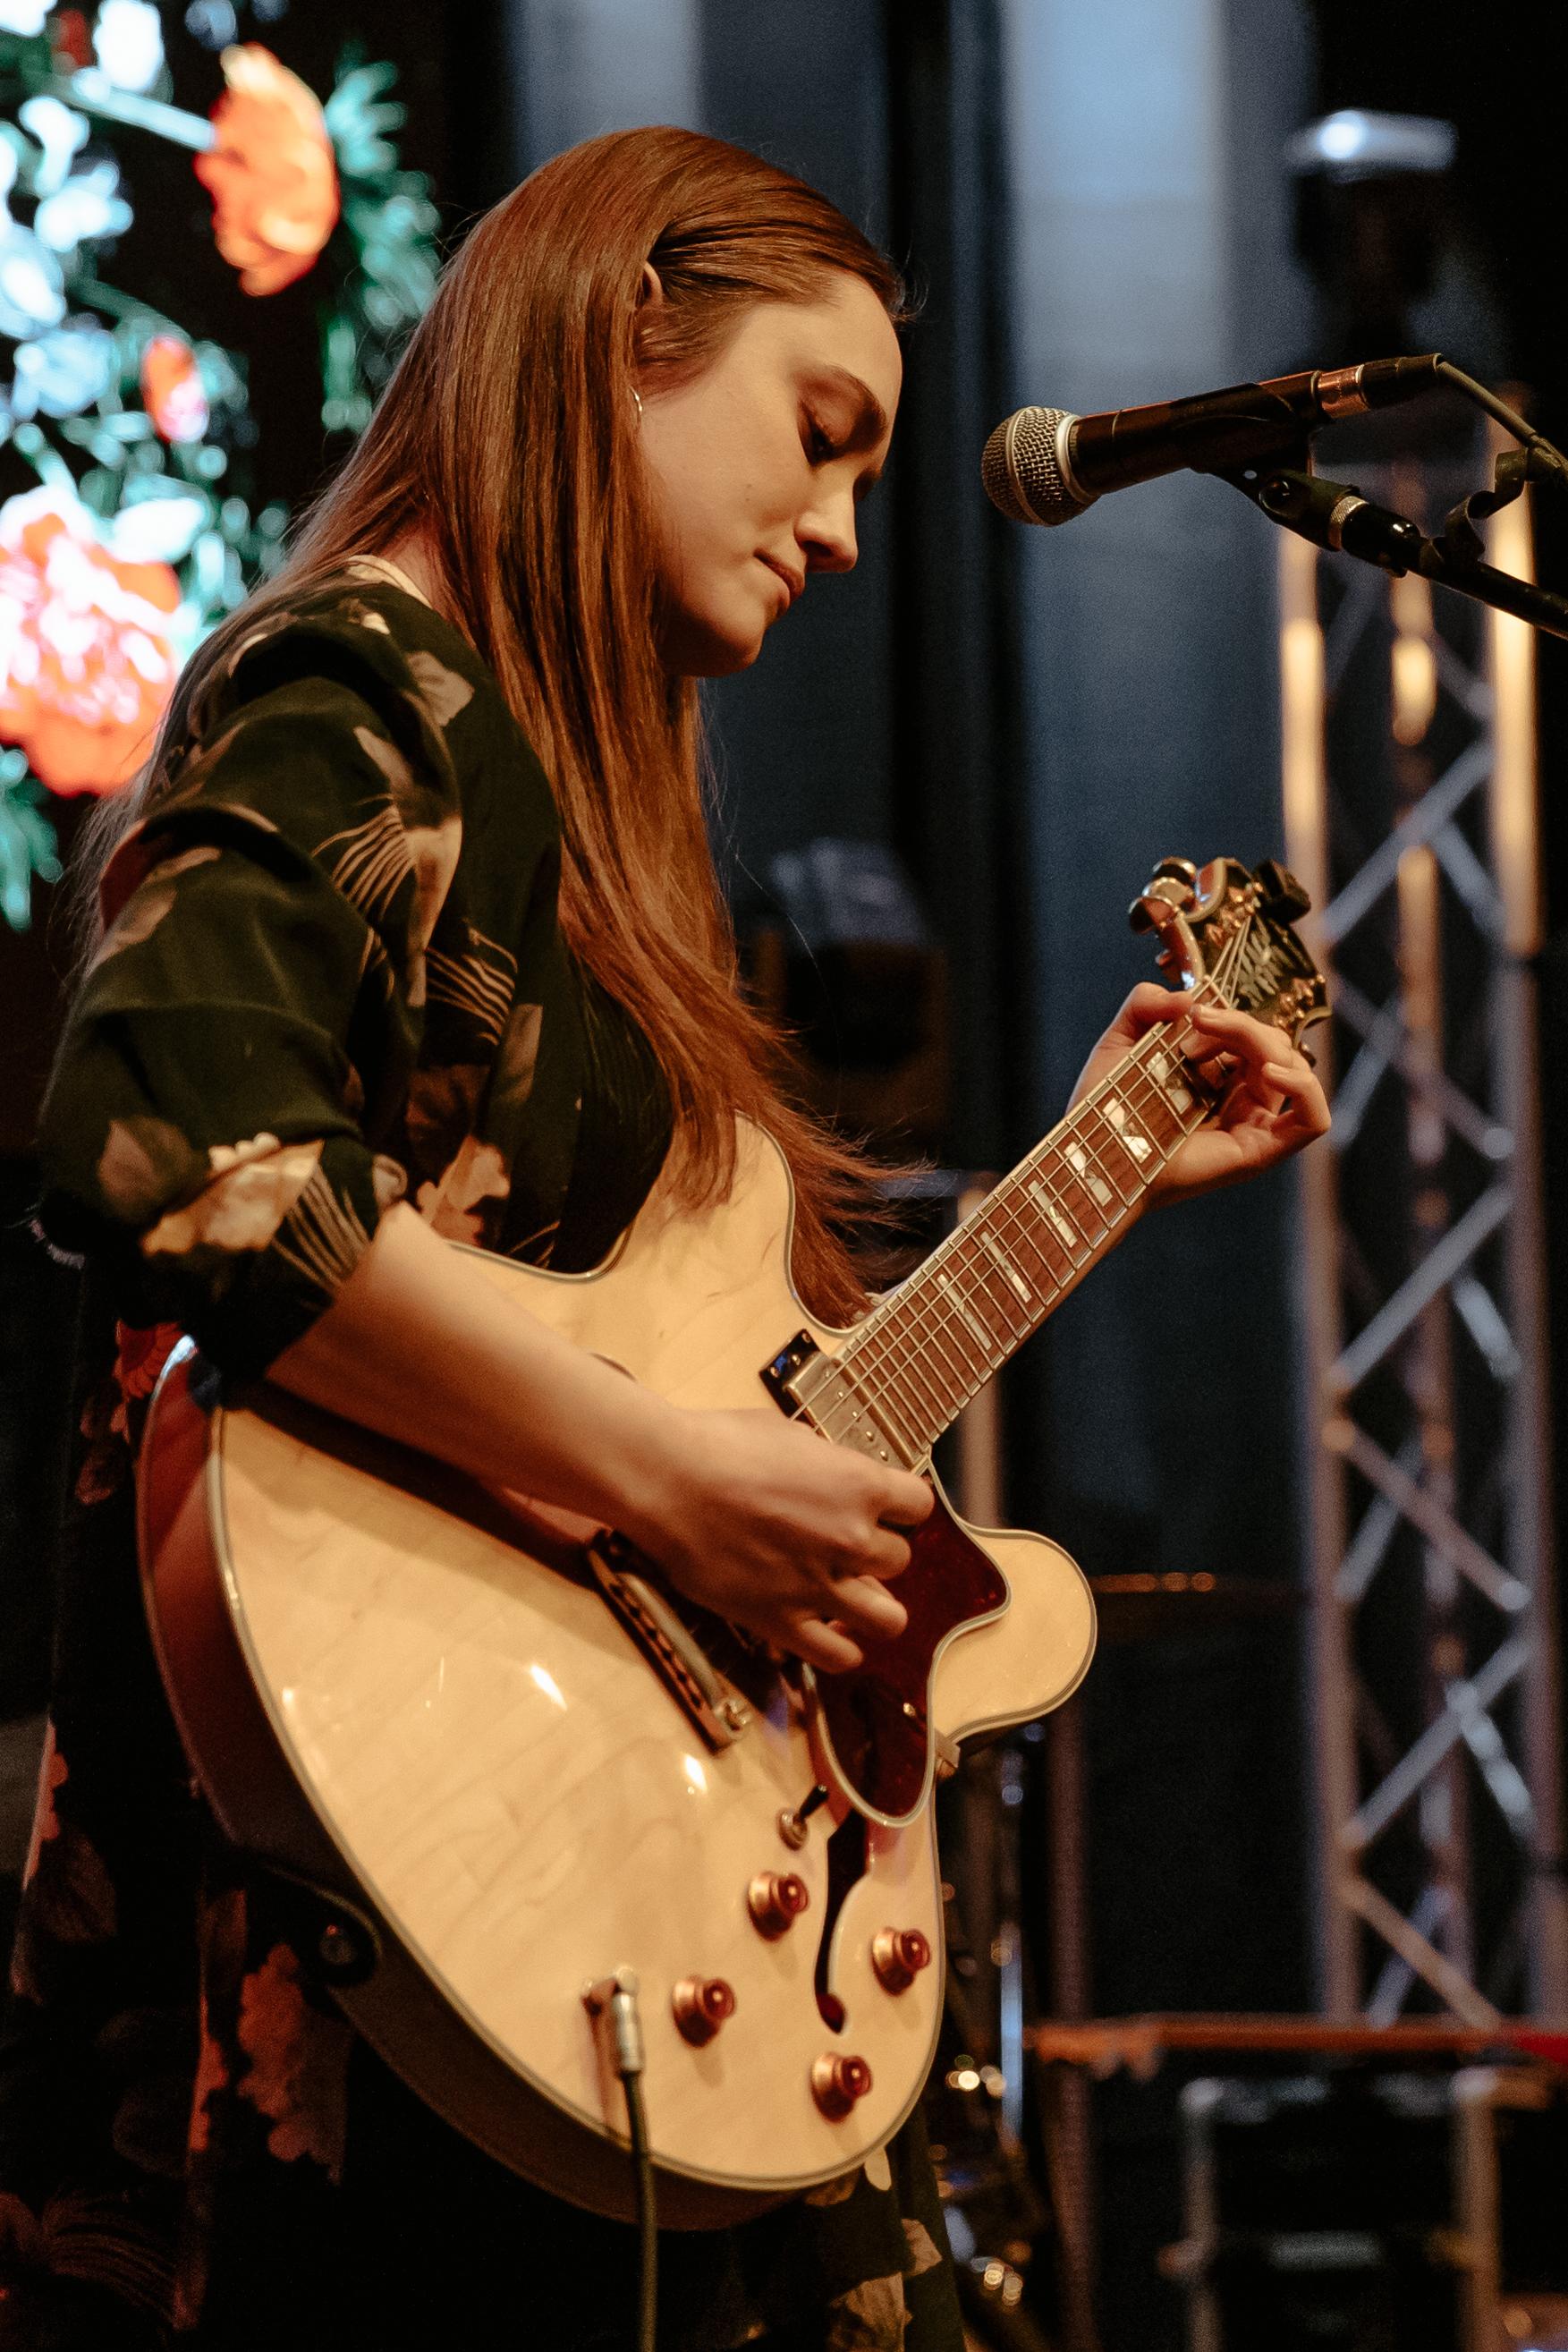 Ellie Schmidly